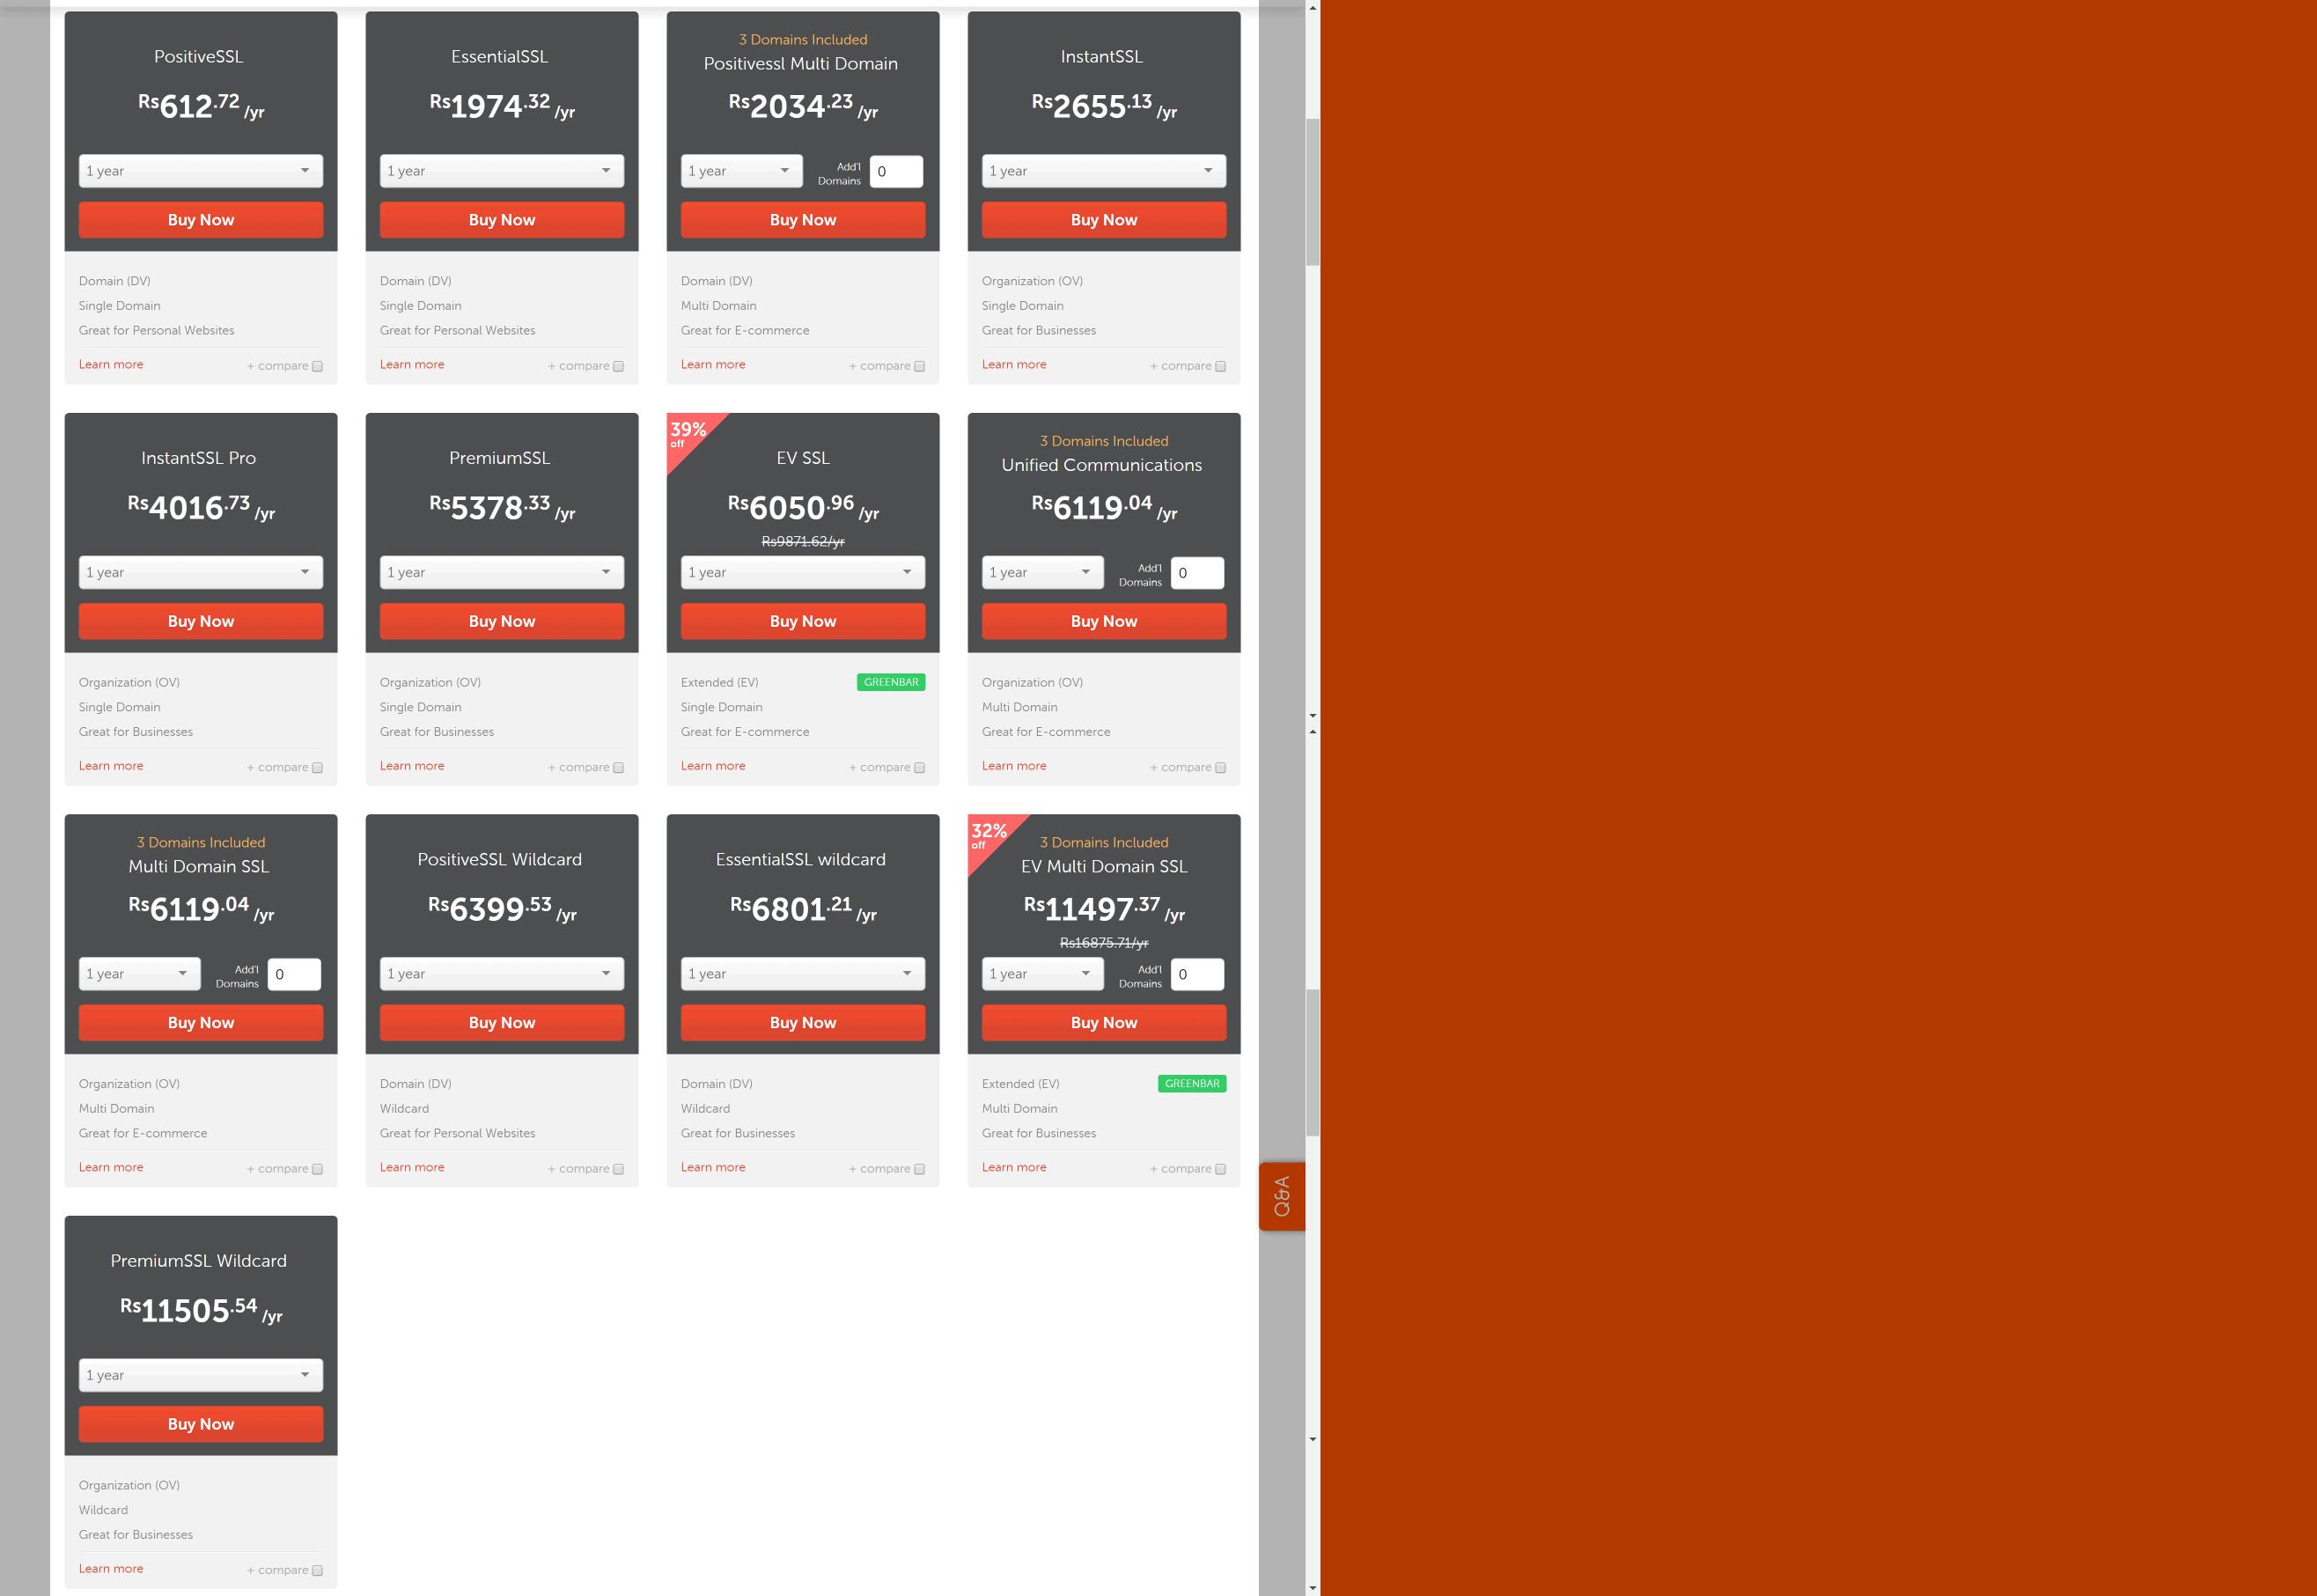 NameCheap Coupon-hosting plans